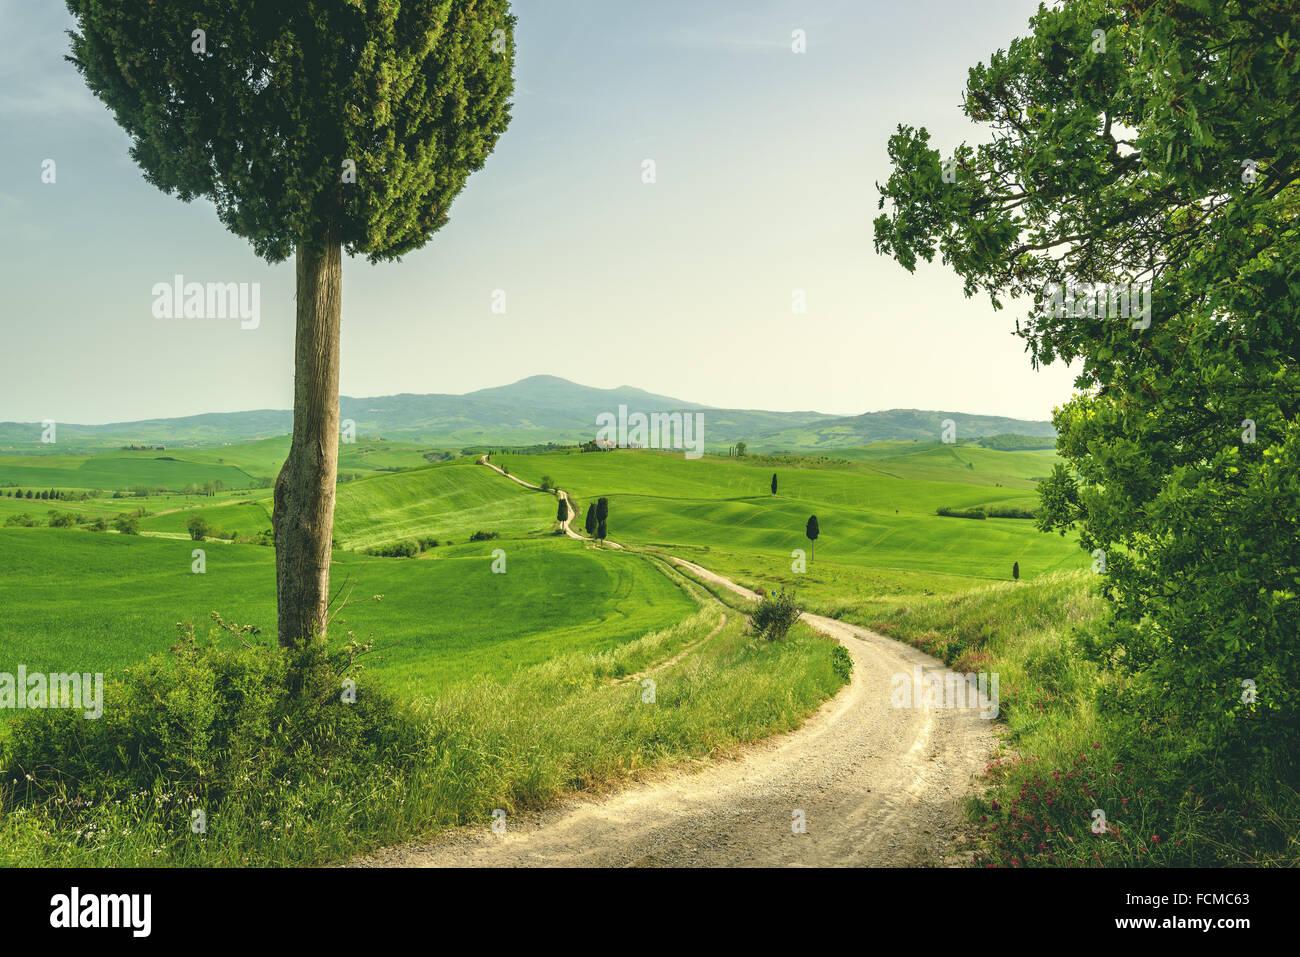 Lieu toscan dans un paysage rural Photo Stock